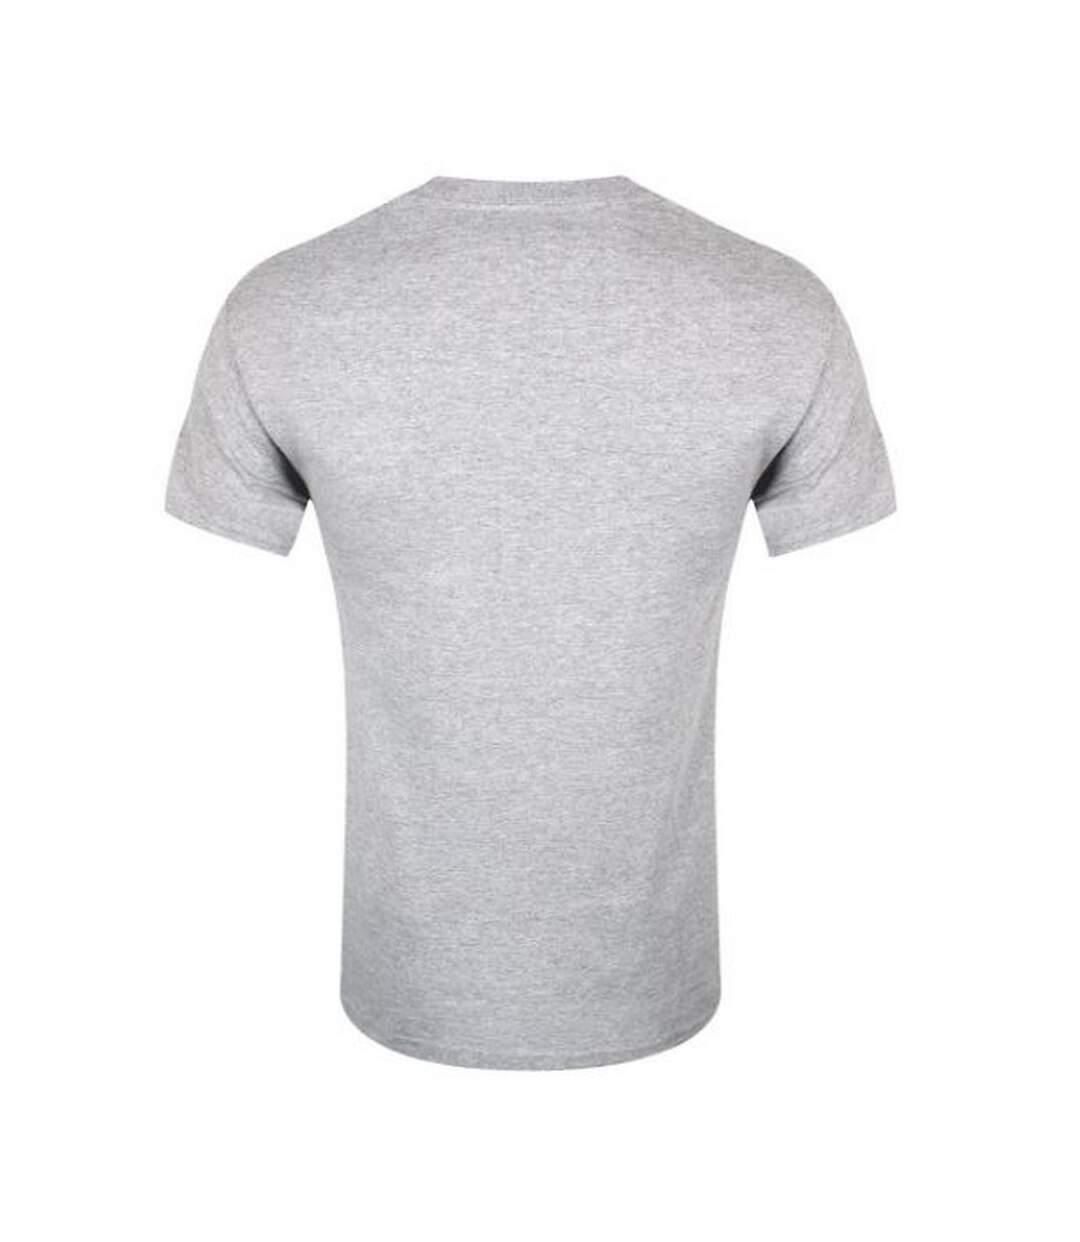 Grindstore Mens Santa Rex Christmas T-Shirt (Grey) - UTGR1971